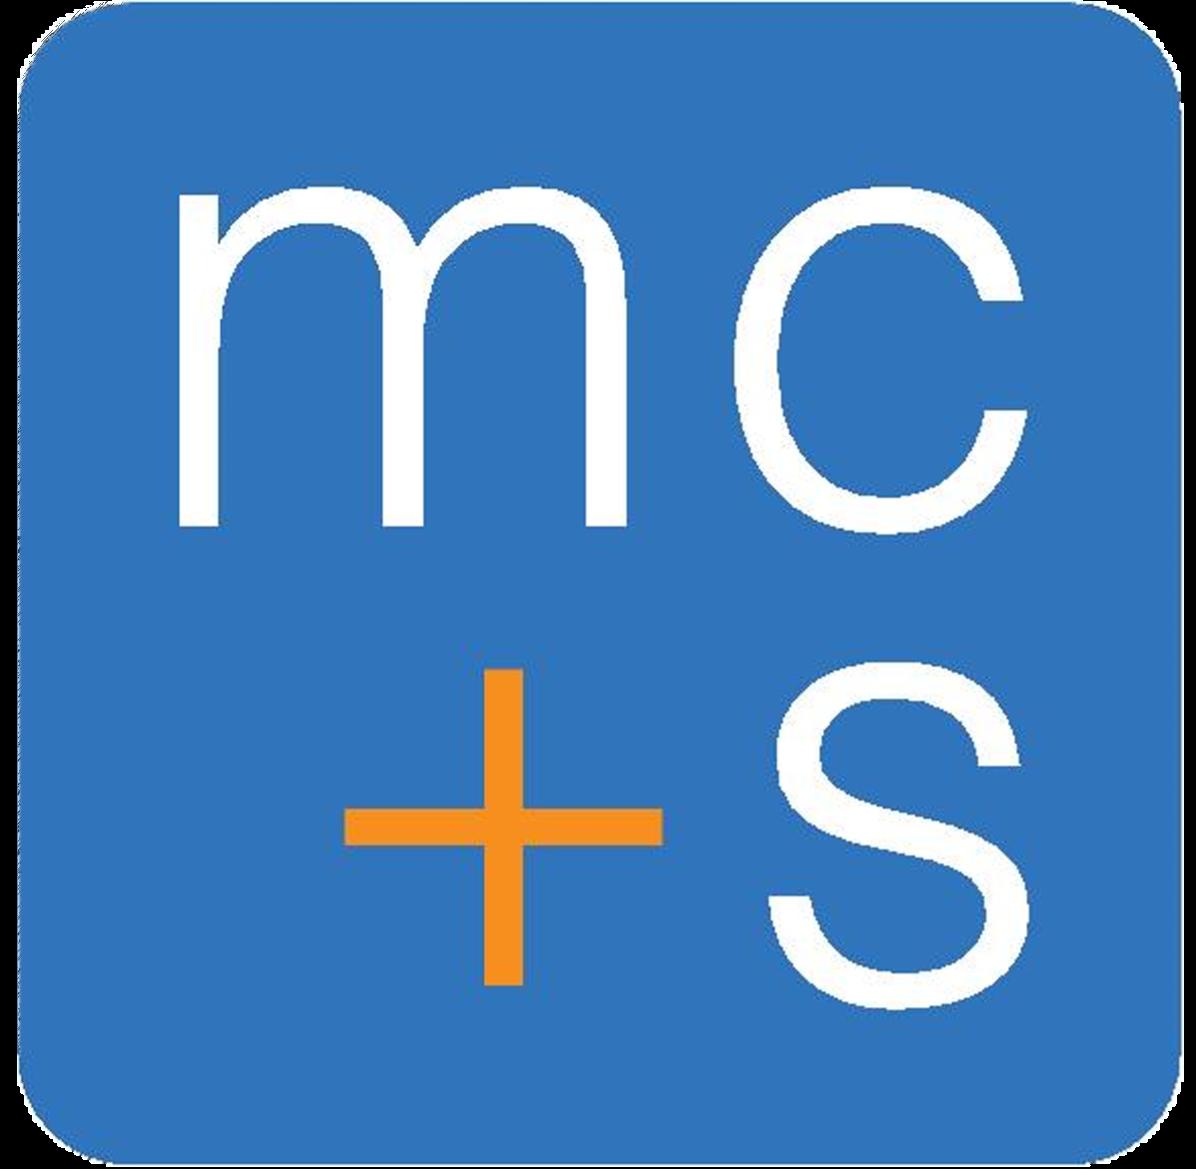 Mercuri-Covelli-Scarton-Logo-1_edited